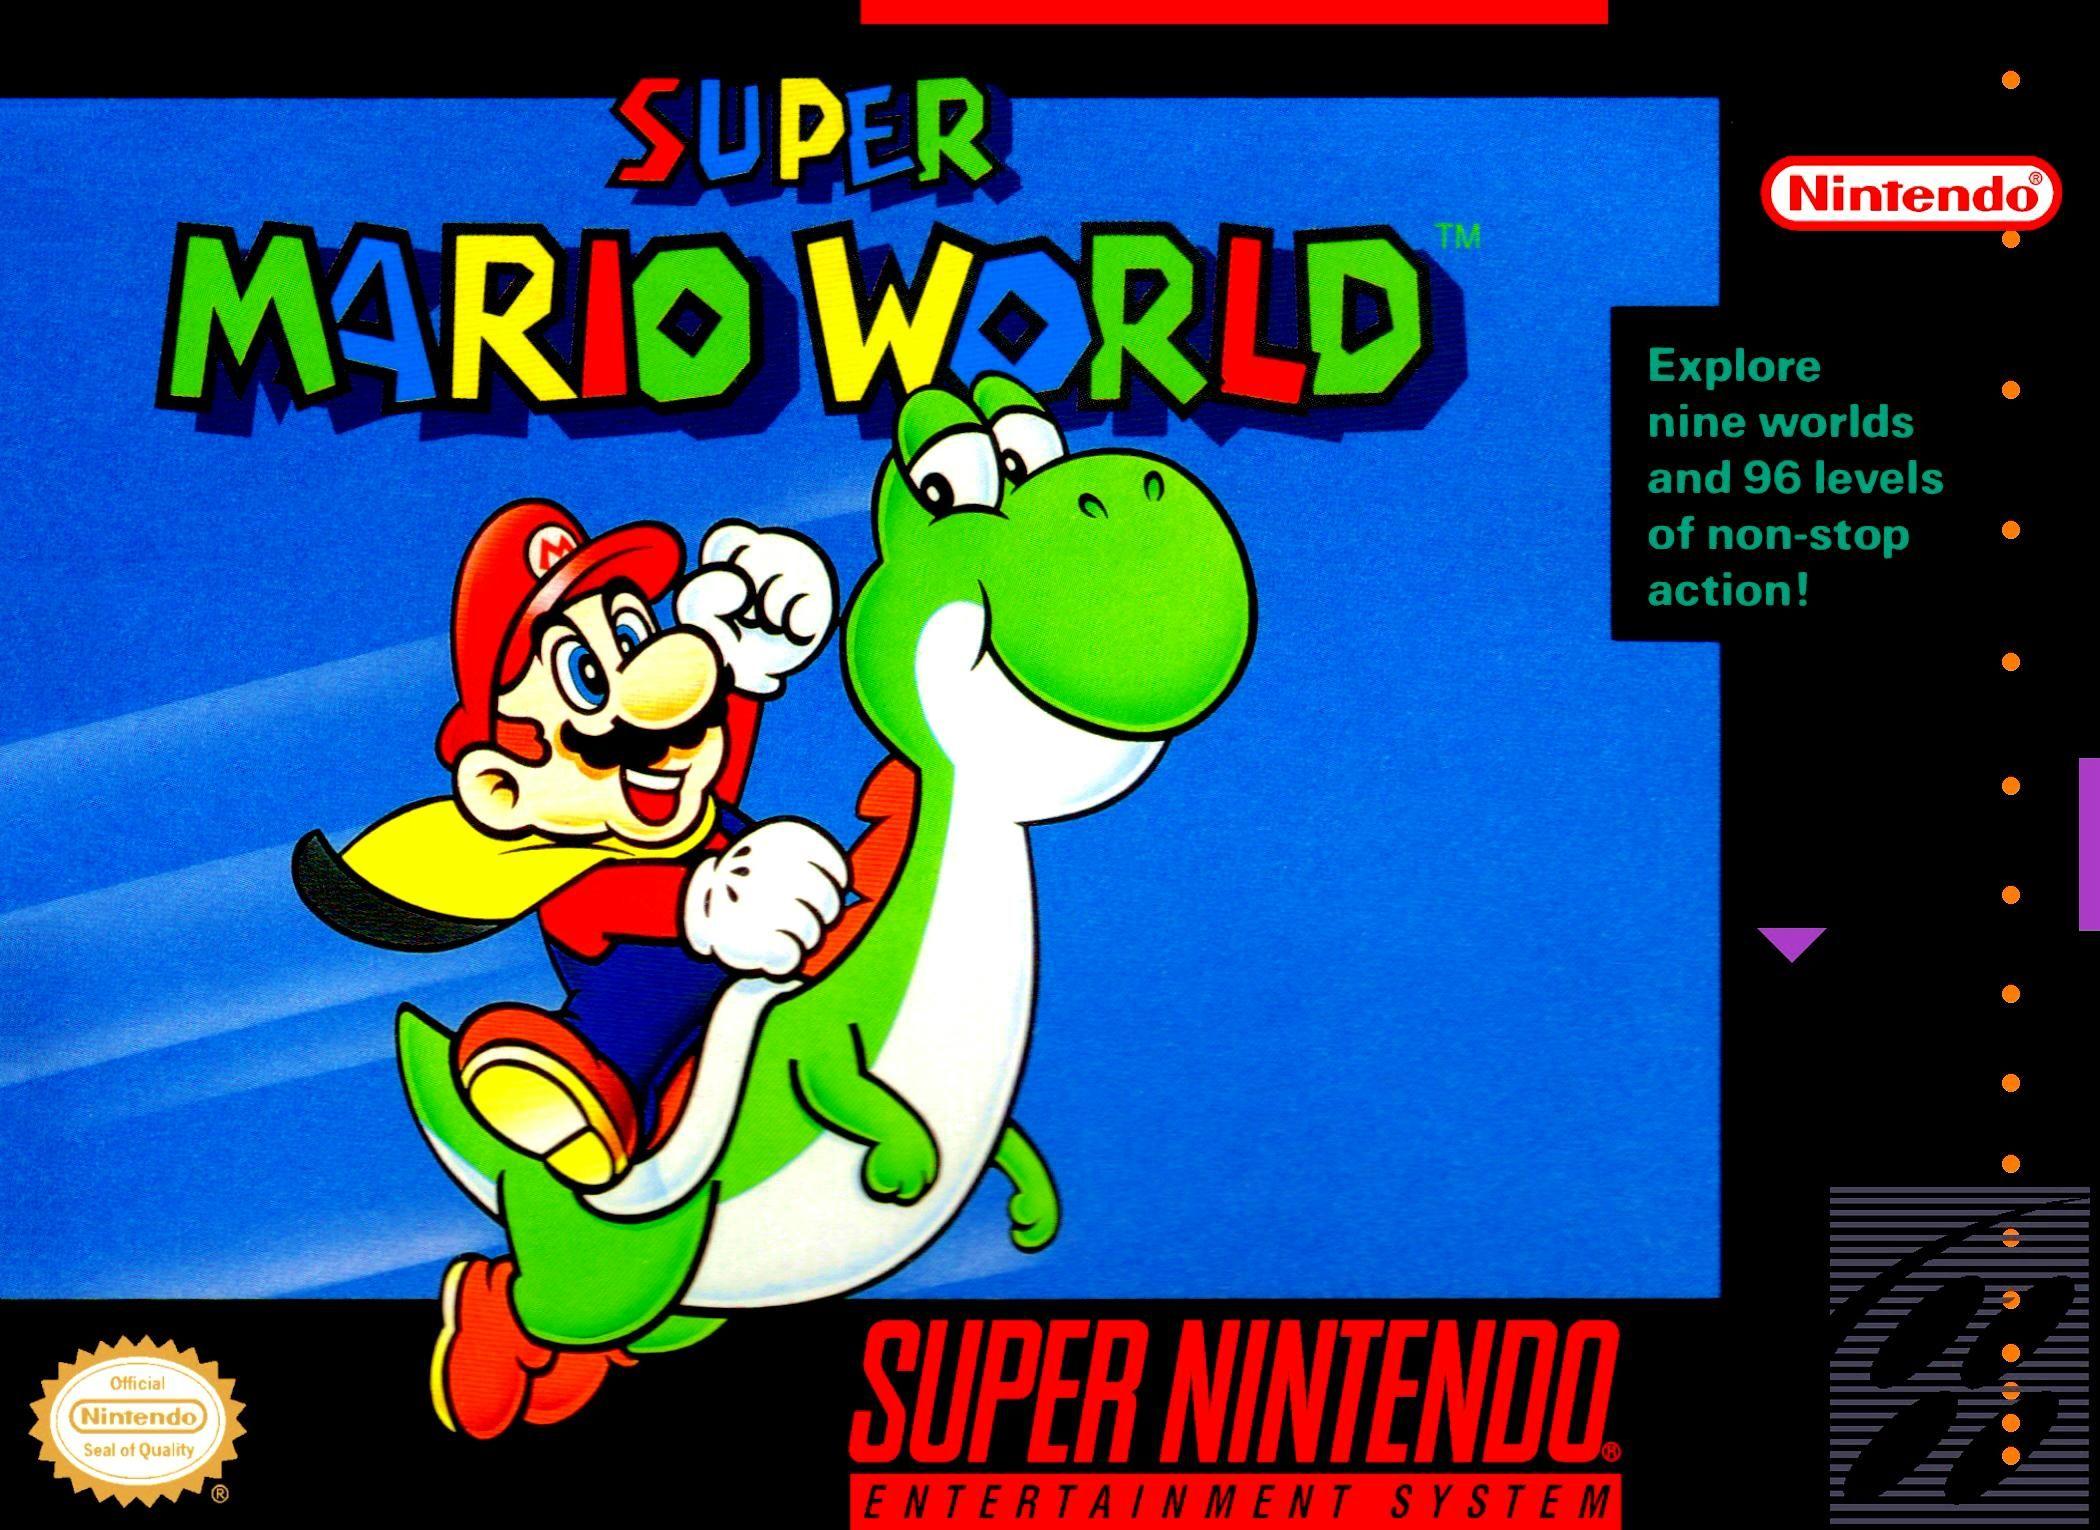 Super Mario World Super Mario Bros Super Mario World Super Nintendo